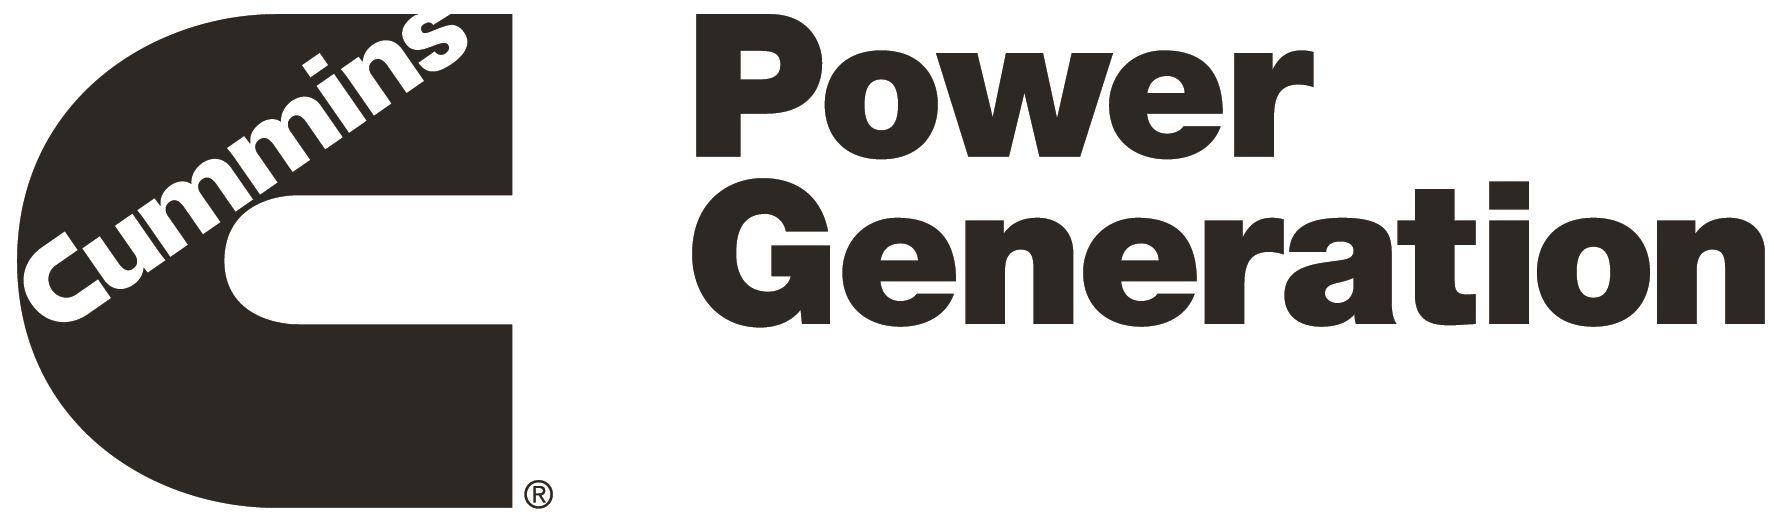 Generator Brands - Whole House Generators by Tropical Generator